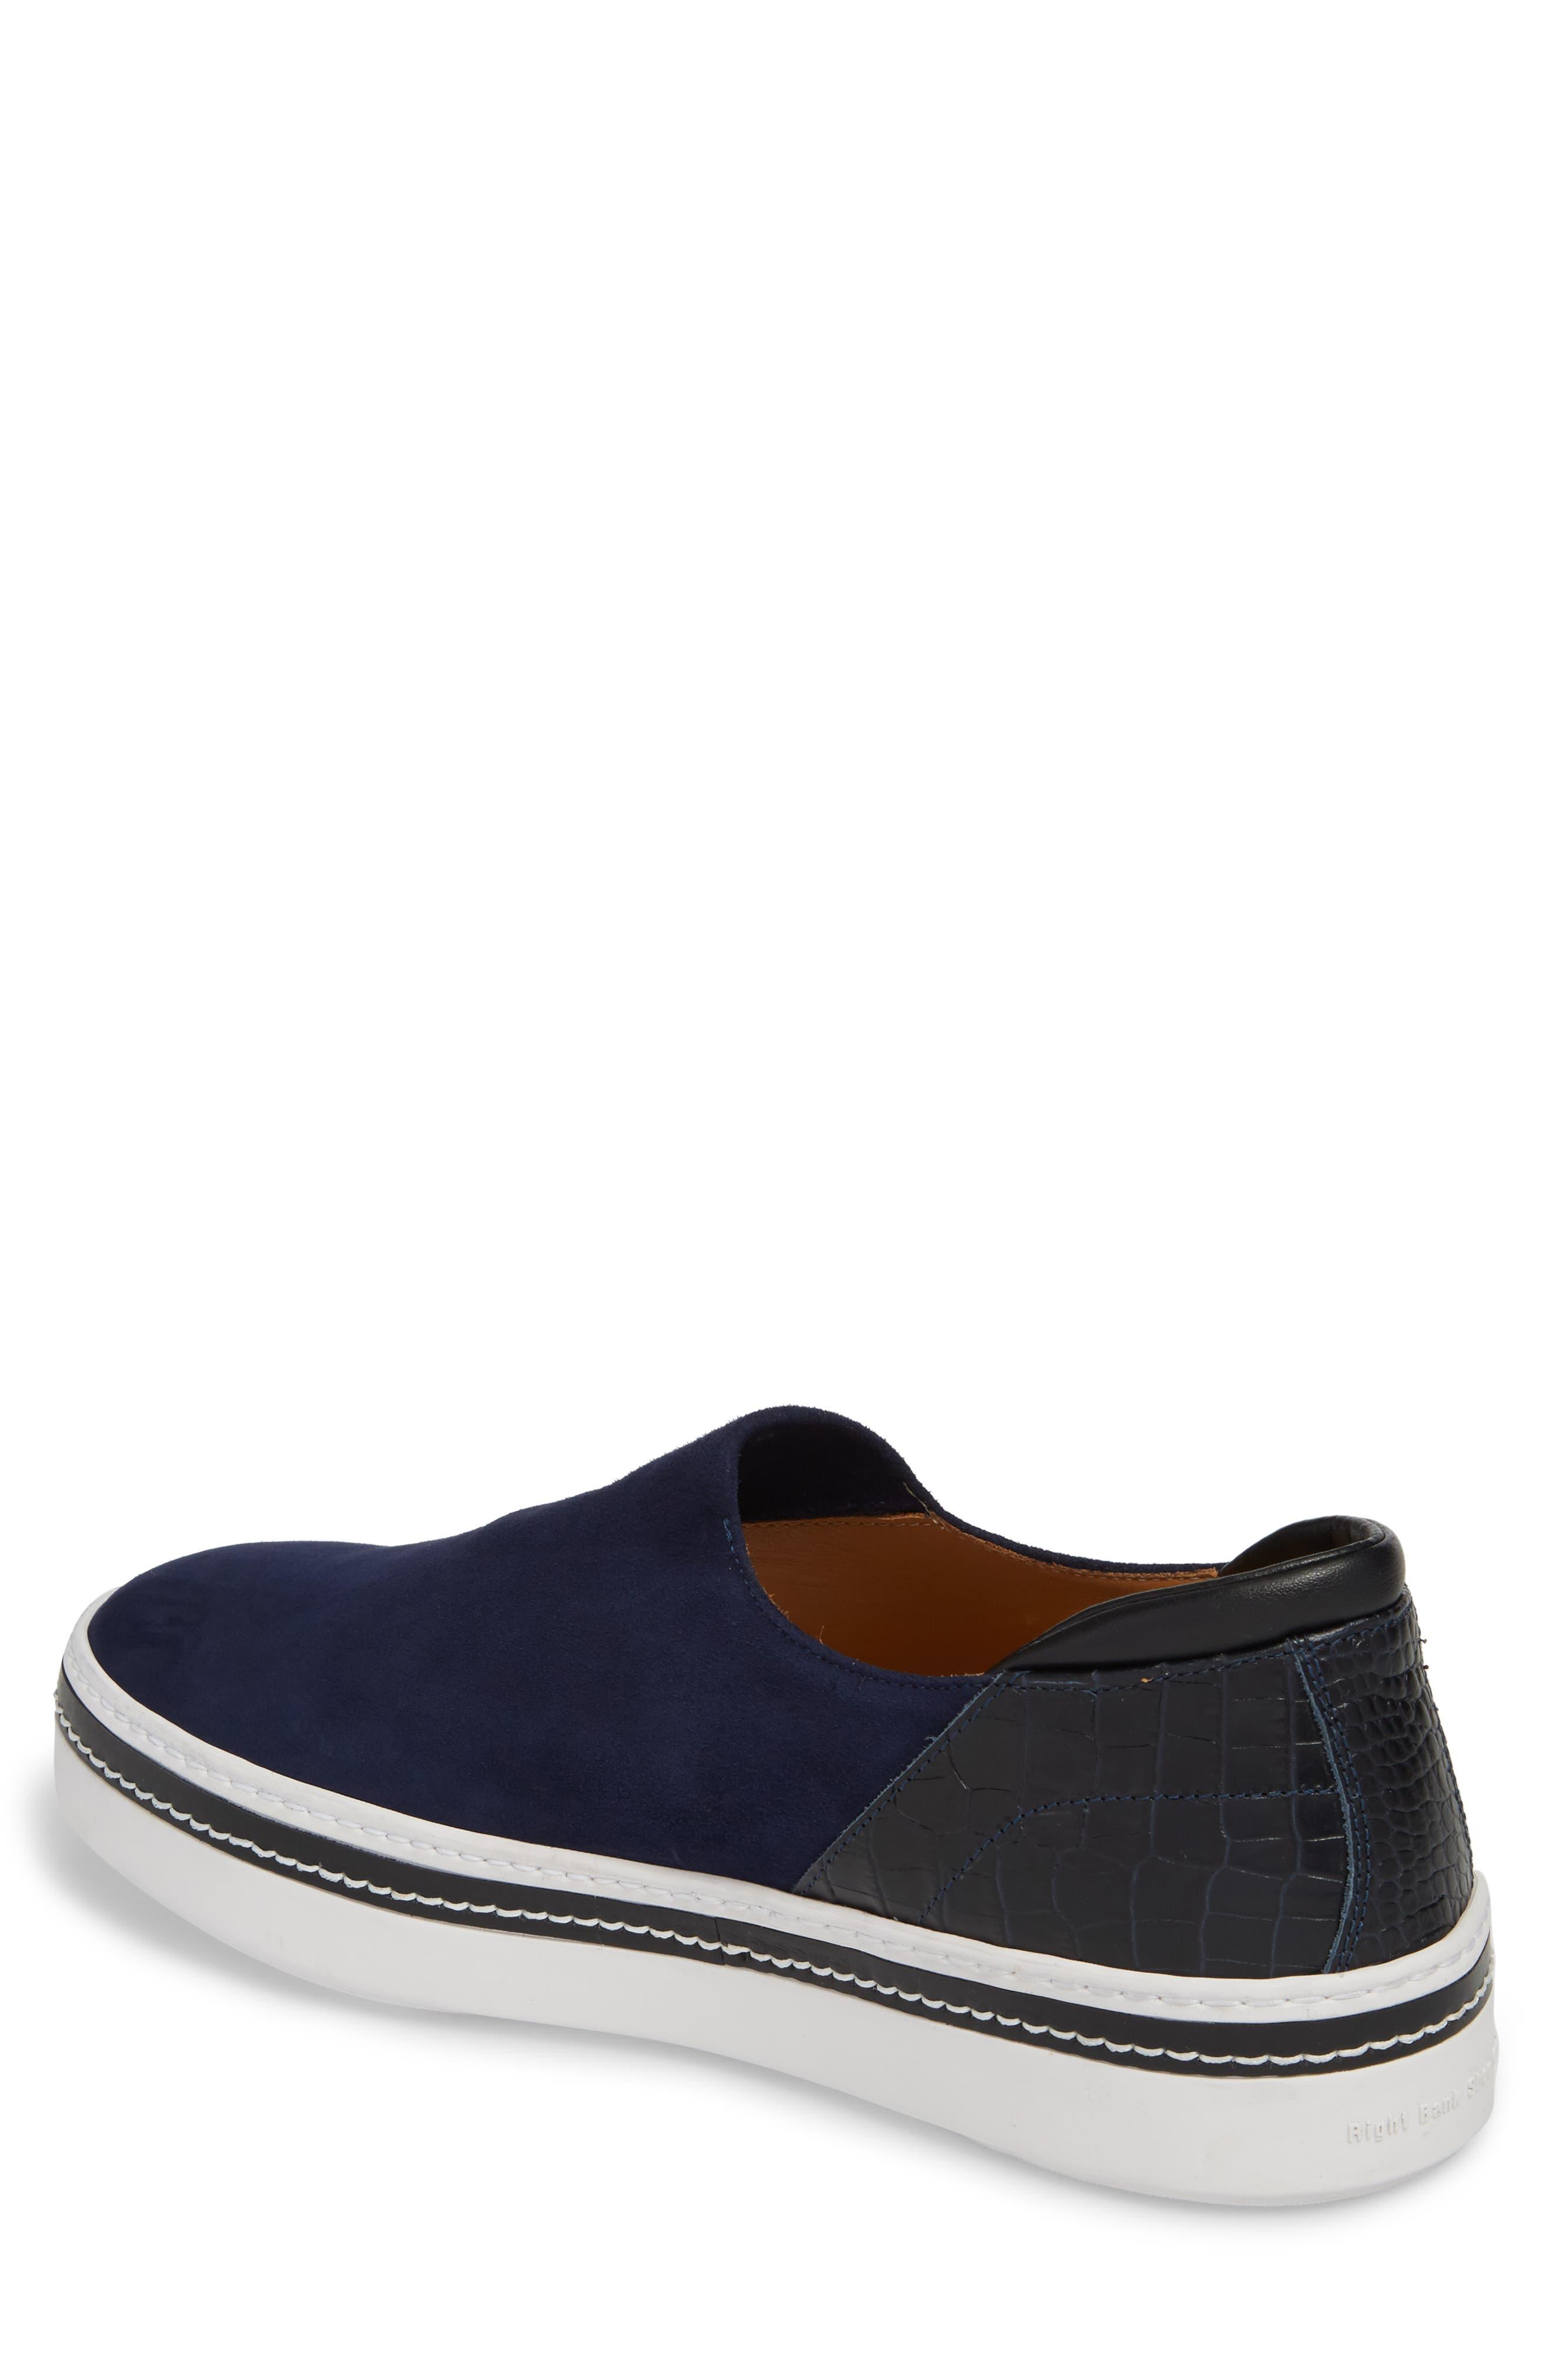 Stan Slip-On Sneaker,                             Alternate thumbnail 2, color,                             Midnight Blue Suede